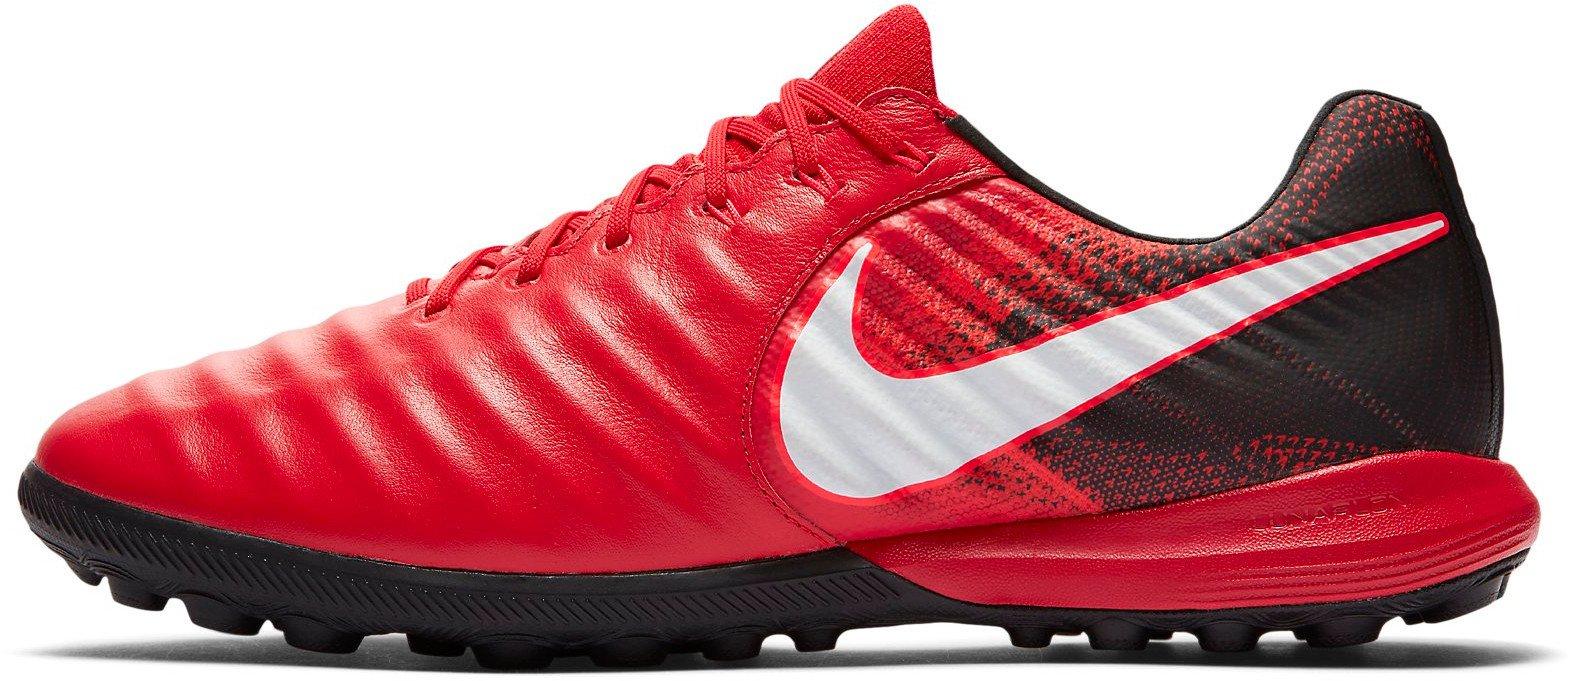 Football shoes Nike TIEMPOX PROXIMO II TF - Top4Football.com